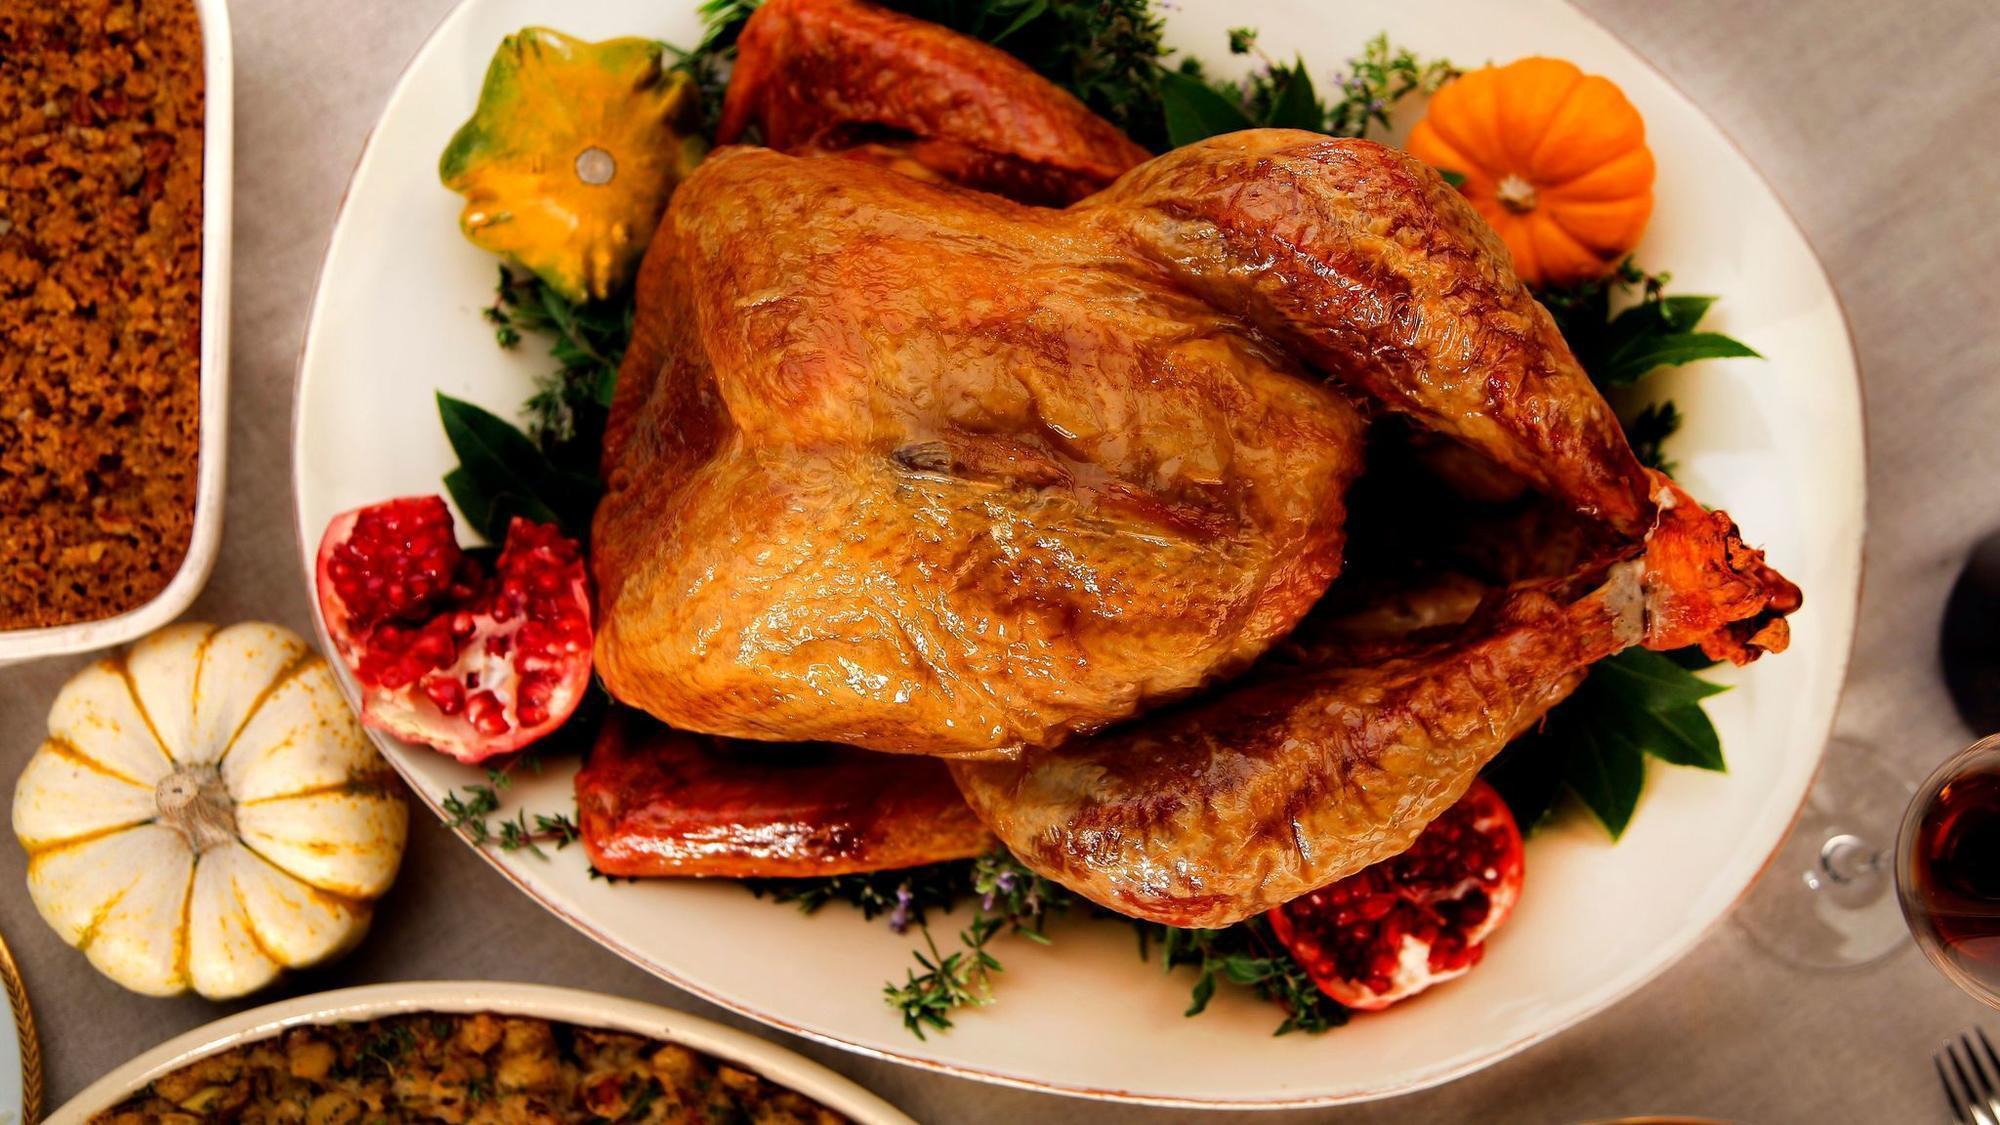 Bake Thanksgiving Turkey  Turkey 101 How to cook a Thanksgiving turkey LA Times